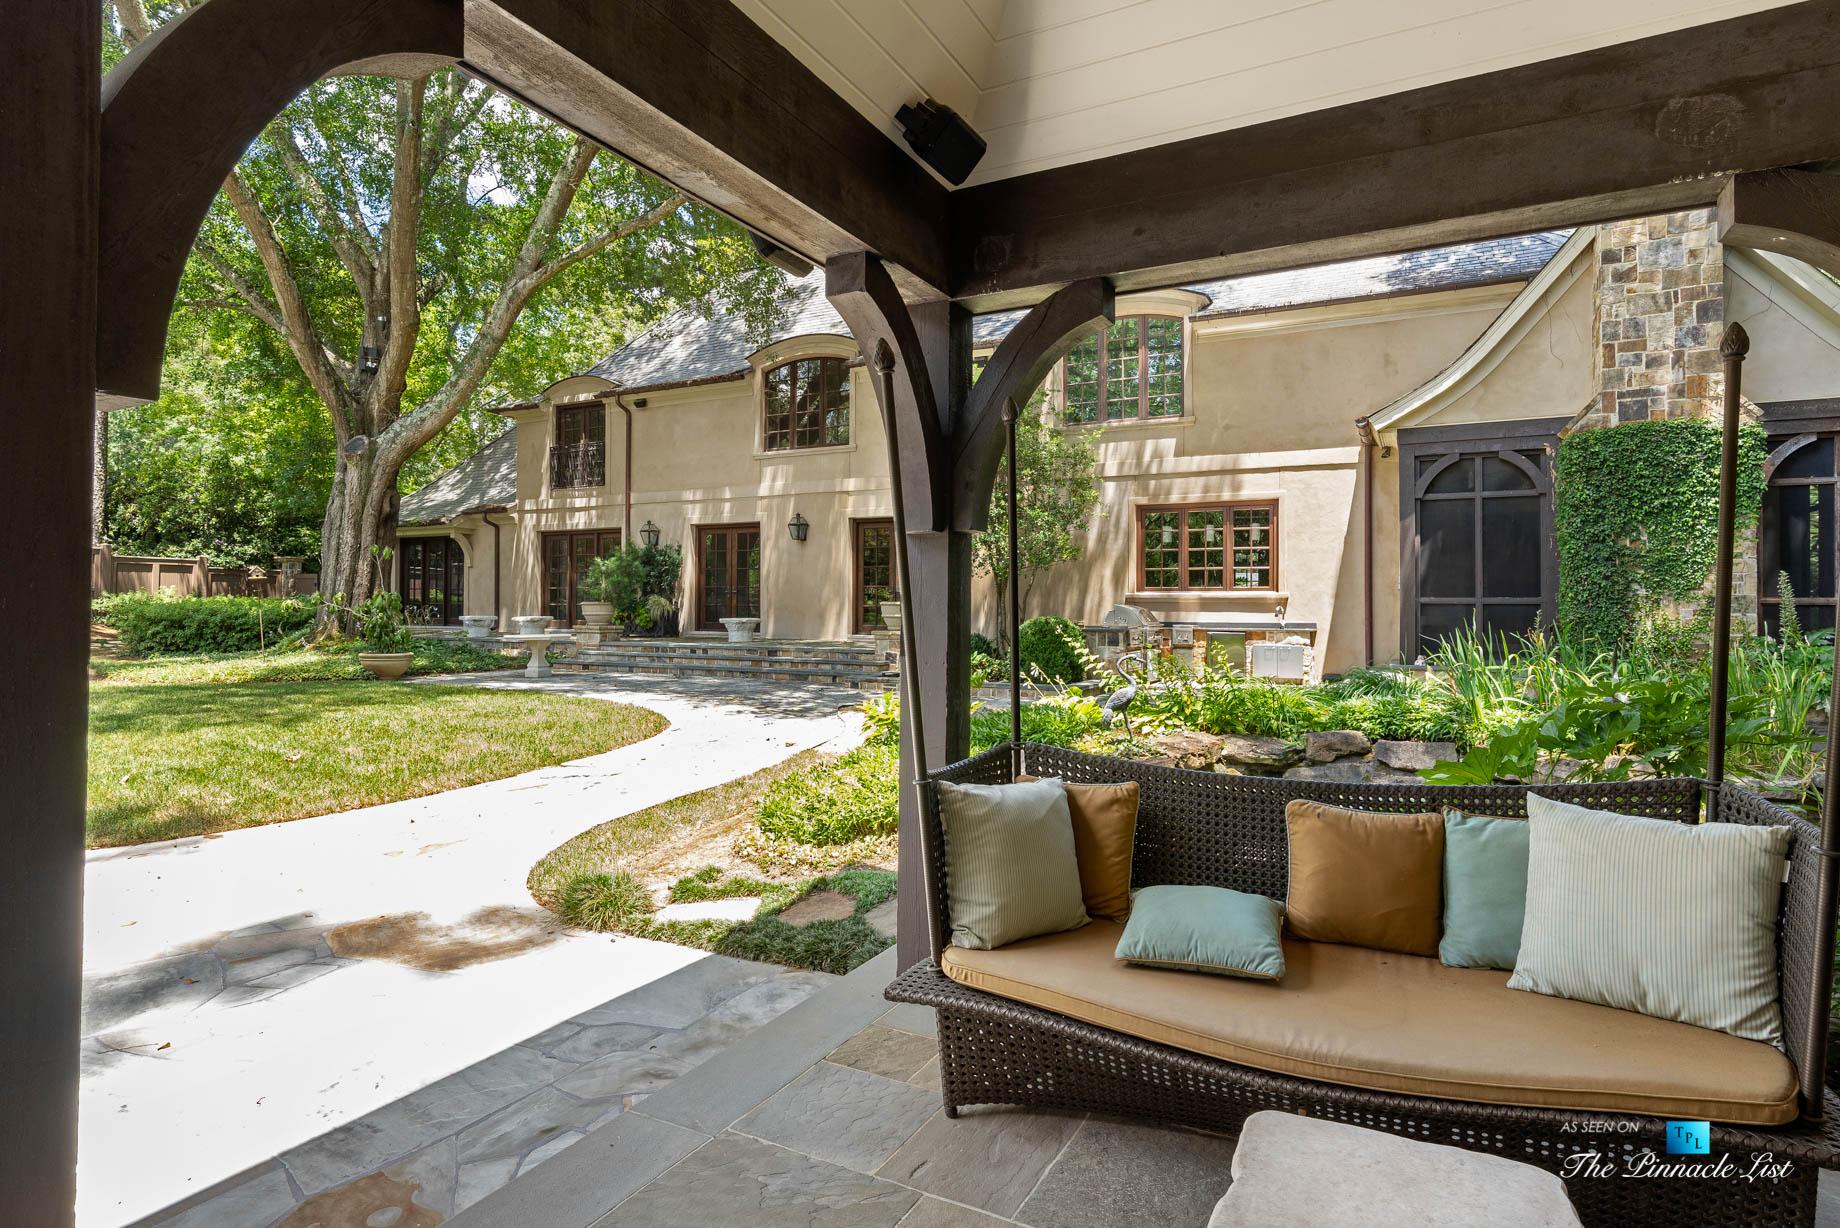 Luxury Real Estate - 450 Blackland Rd NW, Atlanta, GA, USA